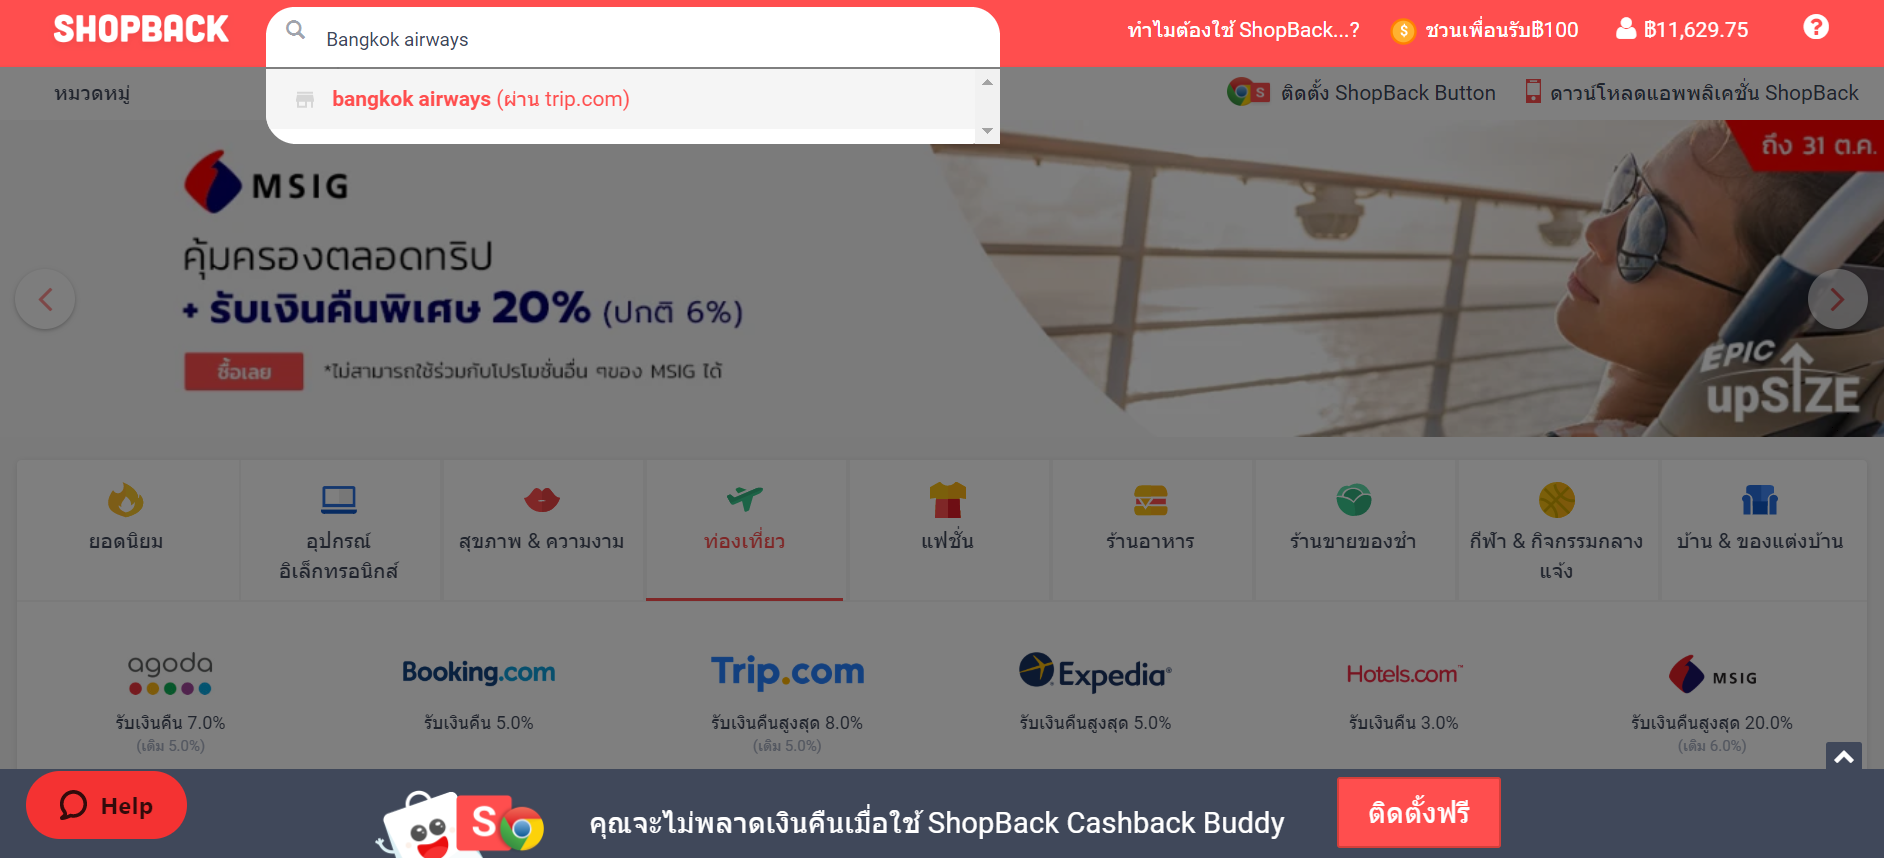 Bangkok airways ผ่าน ShopBack